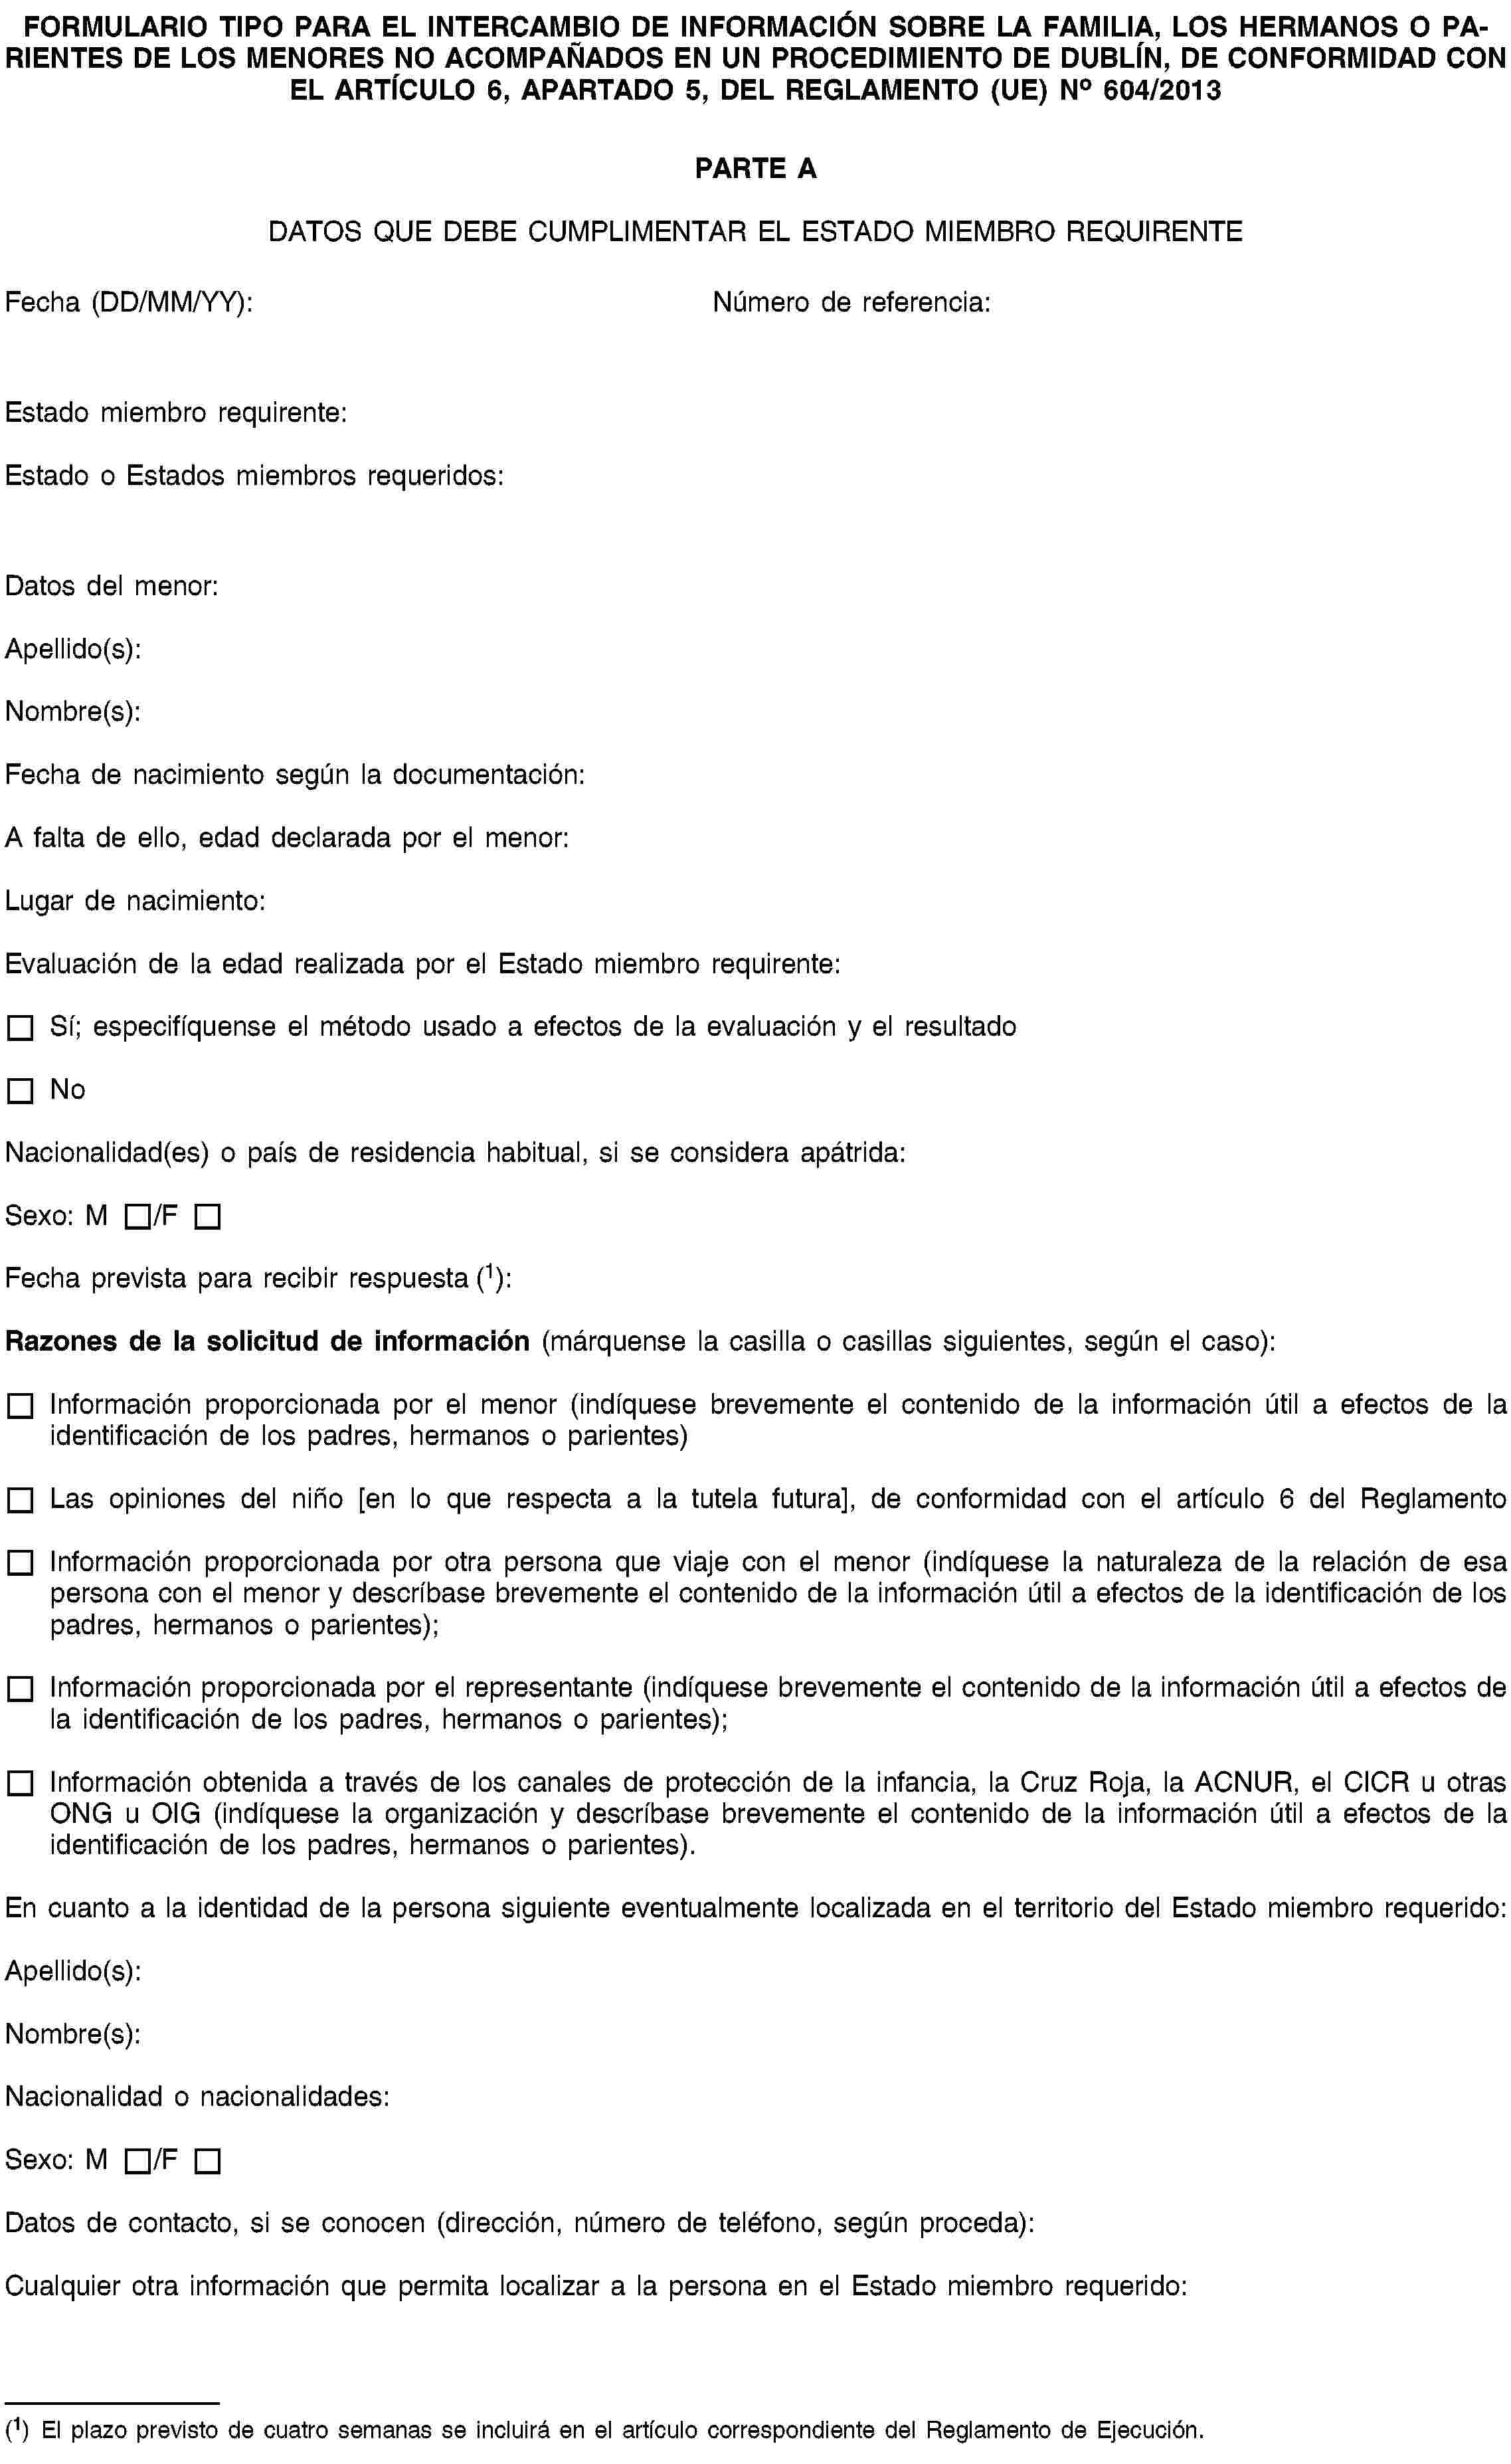 EUR-Lex - 02003R1560-20140209 - EN - EUR-Lex